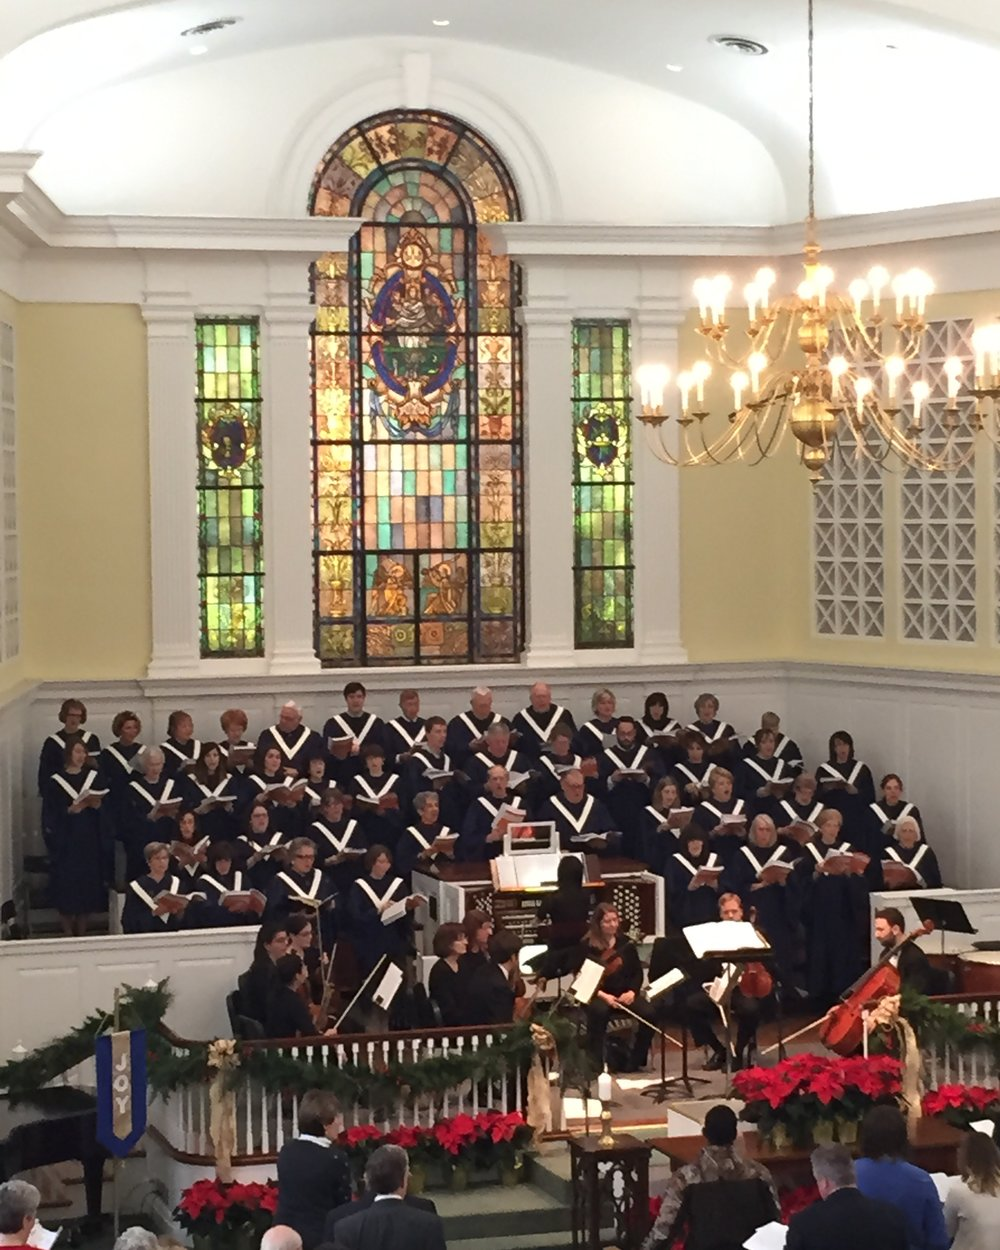 Robert Gammon & the Chancel Choir